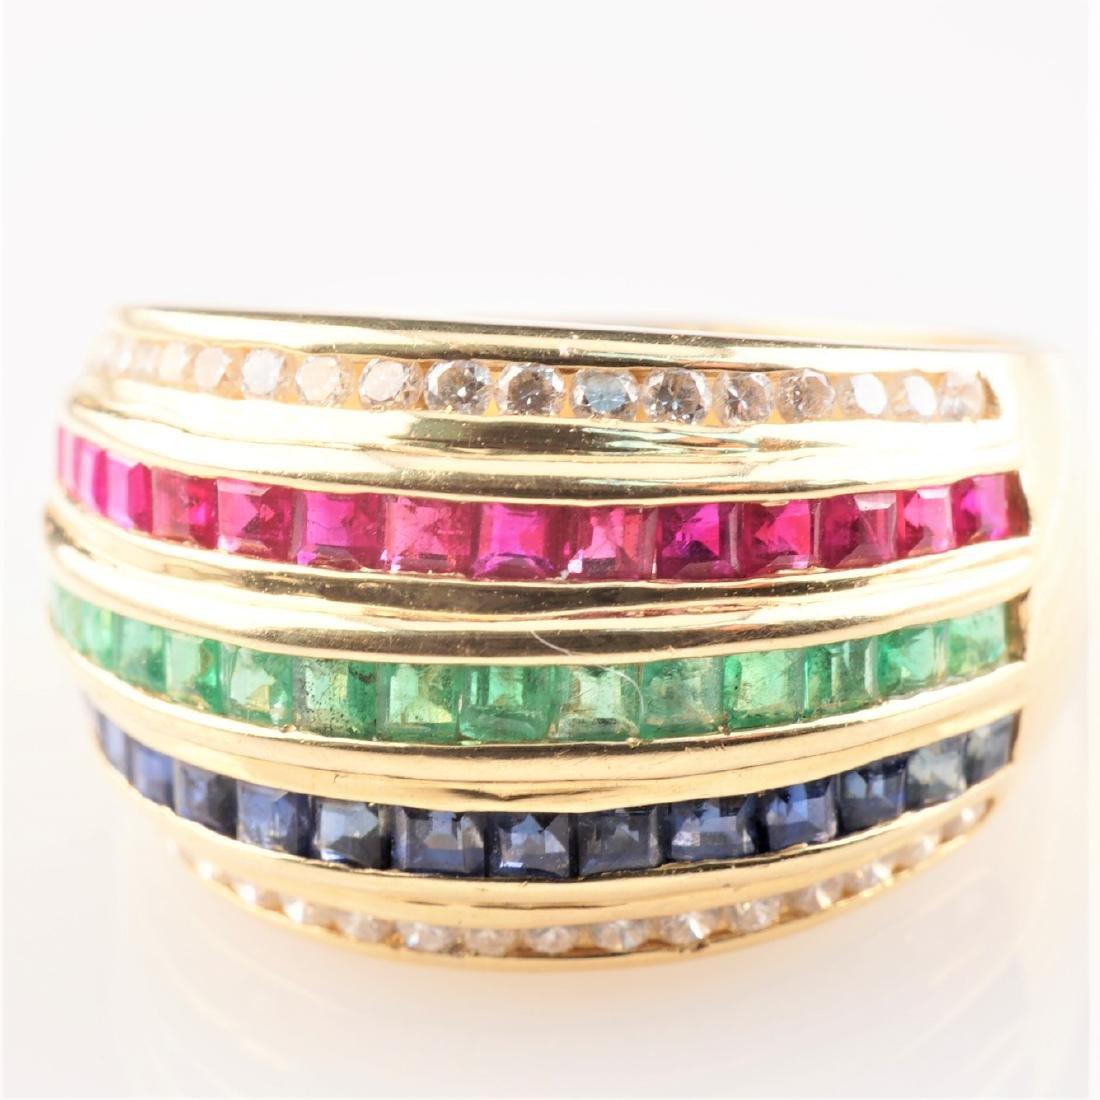 18k YG Ruby Sapphire Emerald & Diamond Ring sz 6.5